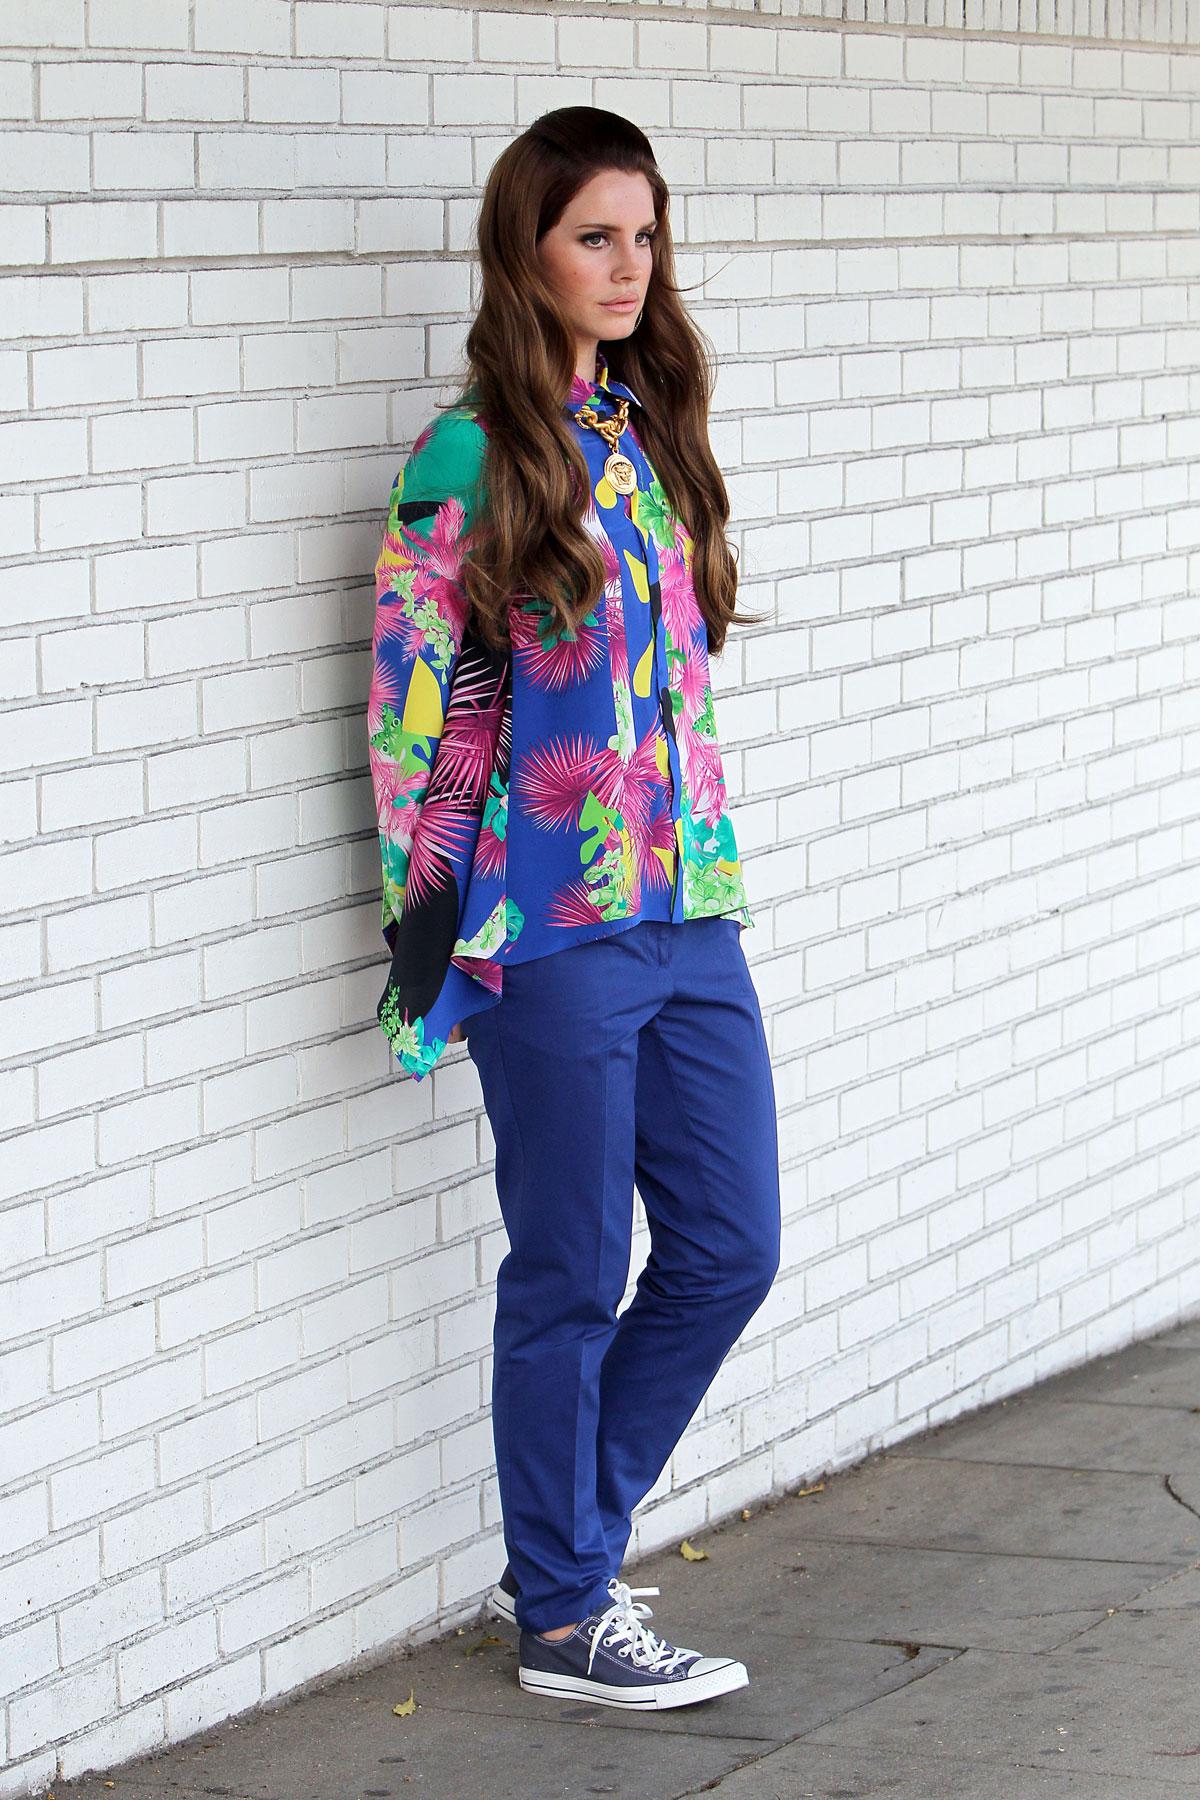 Verter deslealtad Bañera  Lana Del Rey at the Photoshoo for Versace – HawtCelebs